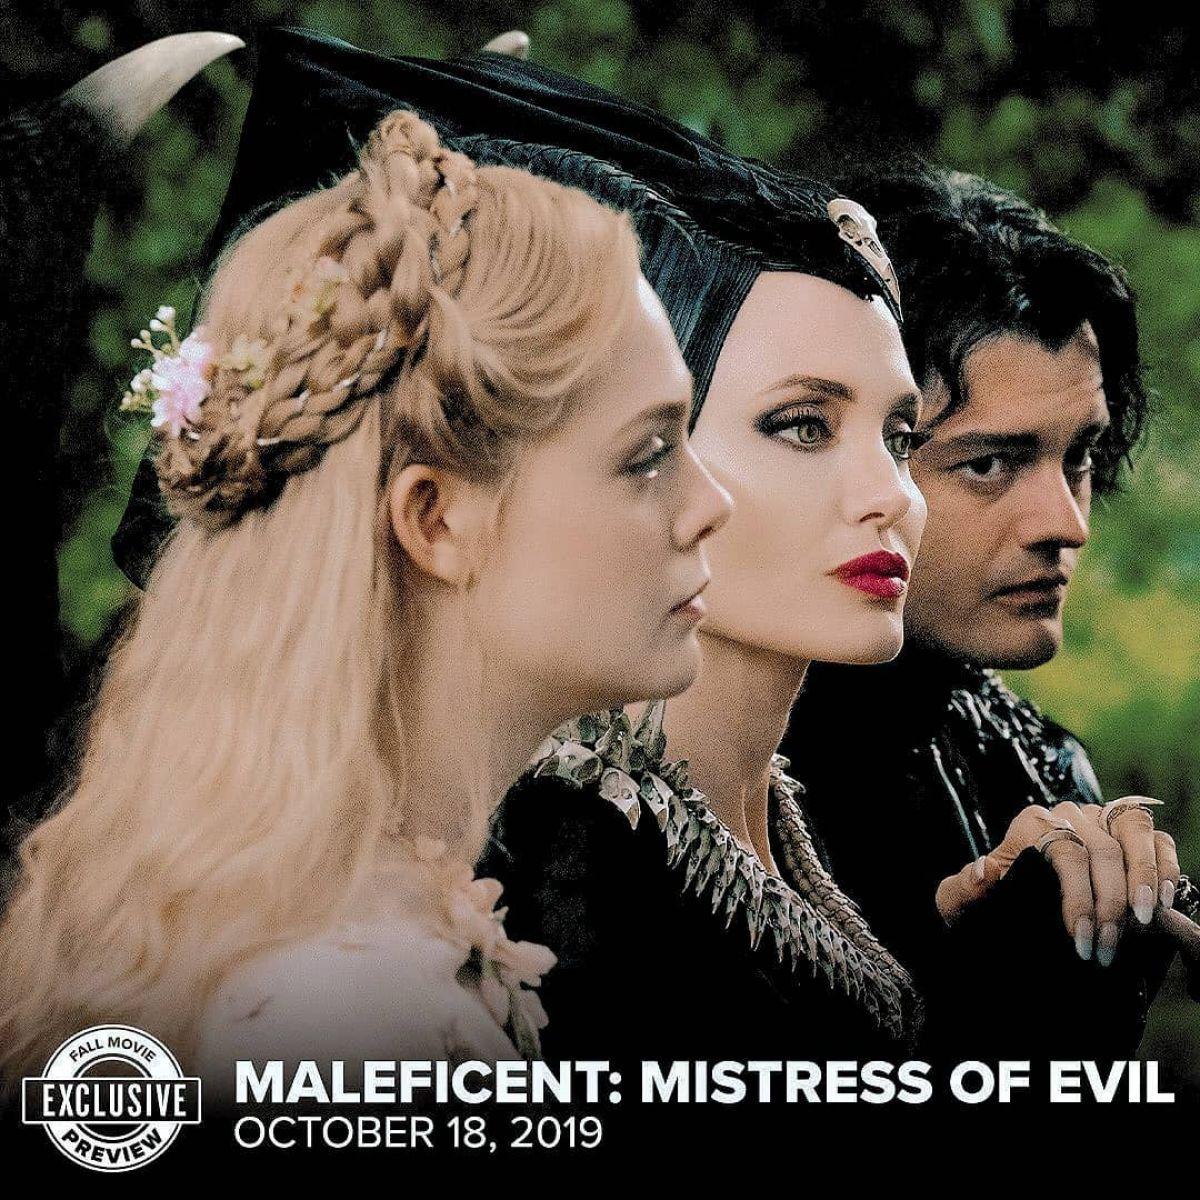 Elle Fanning Maleficent Mistress Of Evil Poster Trailer